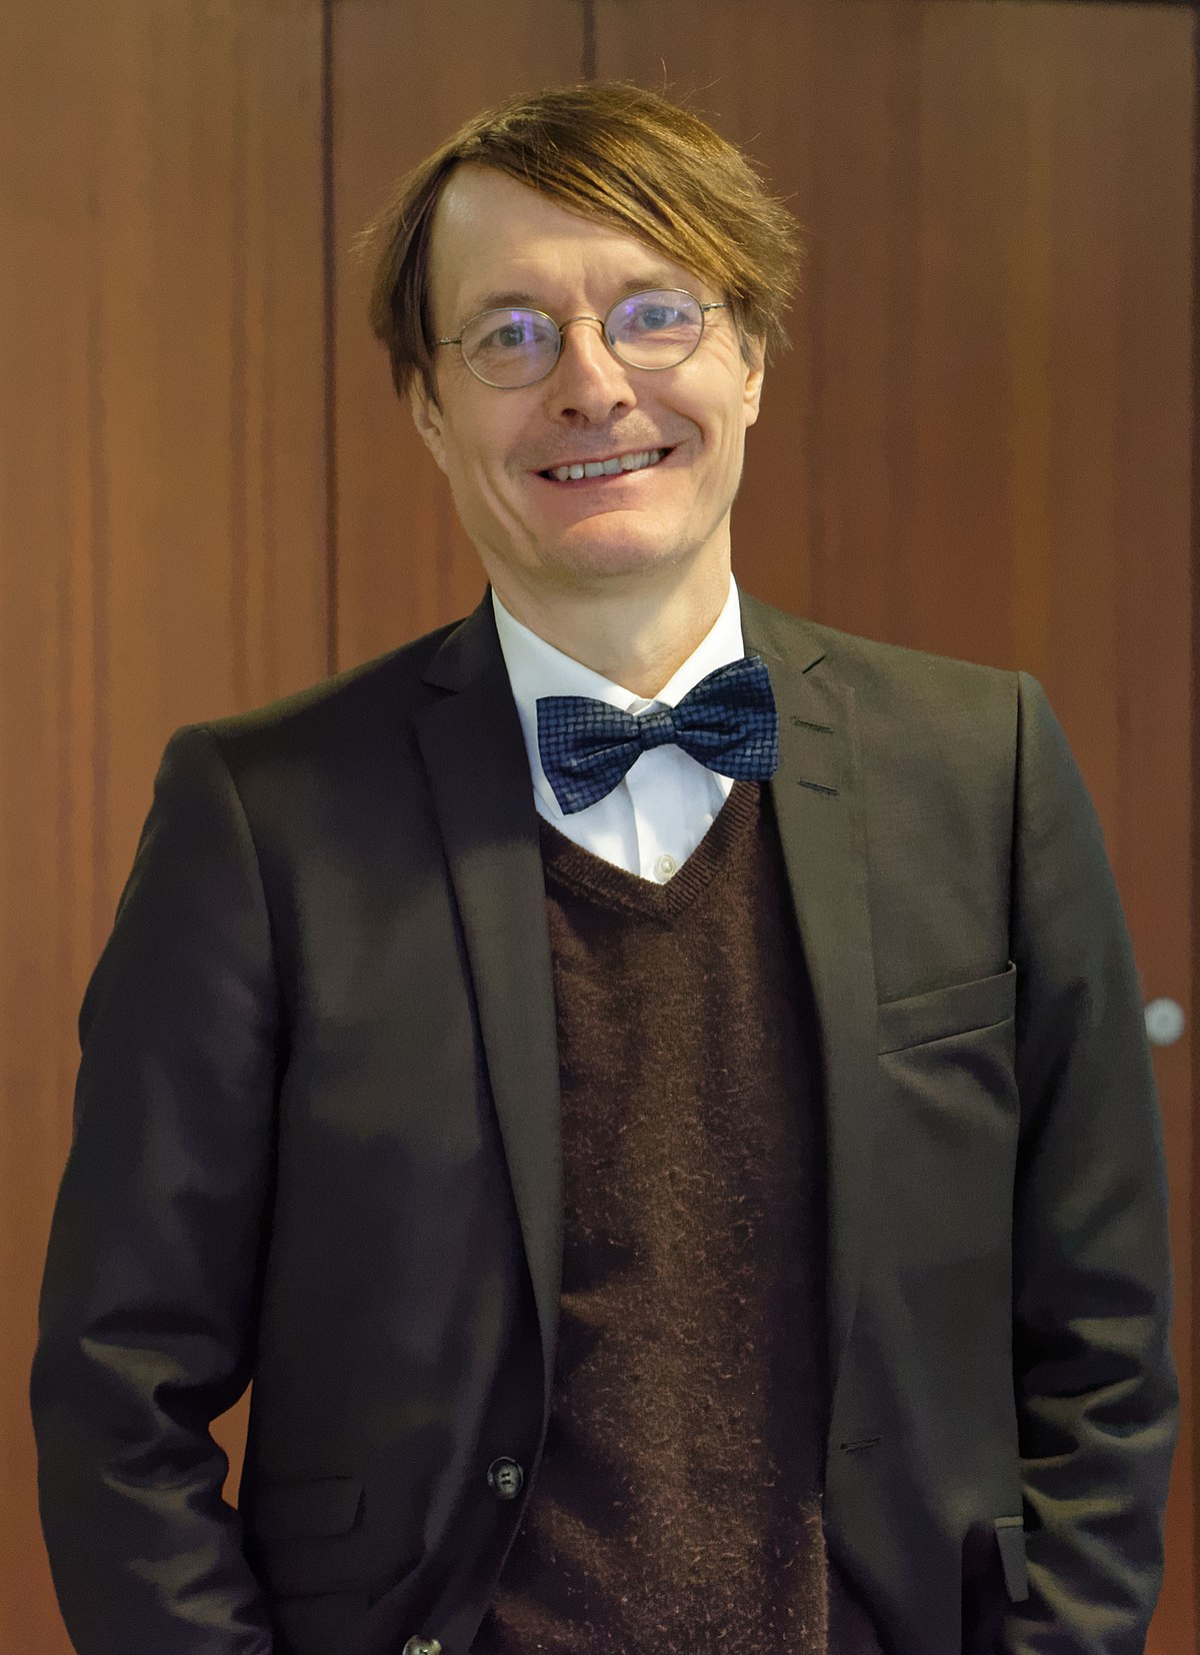 Dr Karl Lauterbach Dissertation Abstracts Rtqcvk Lialkavbo Info